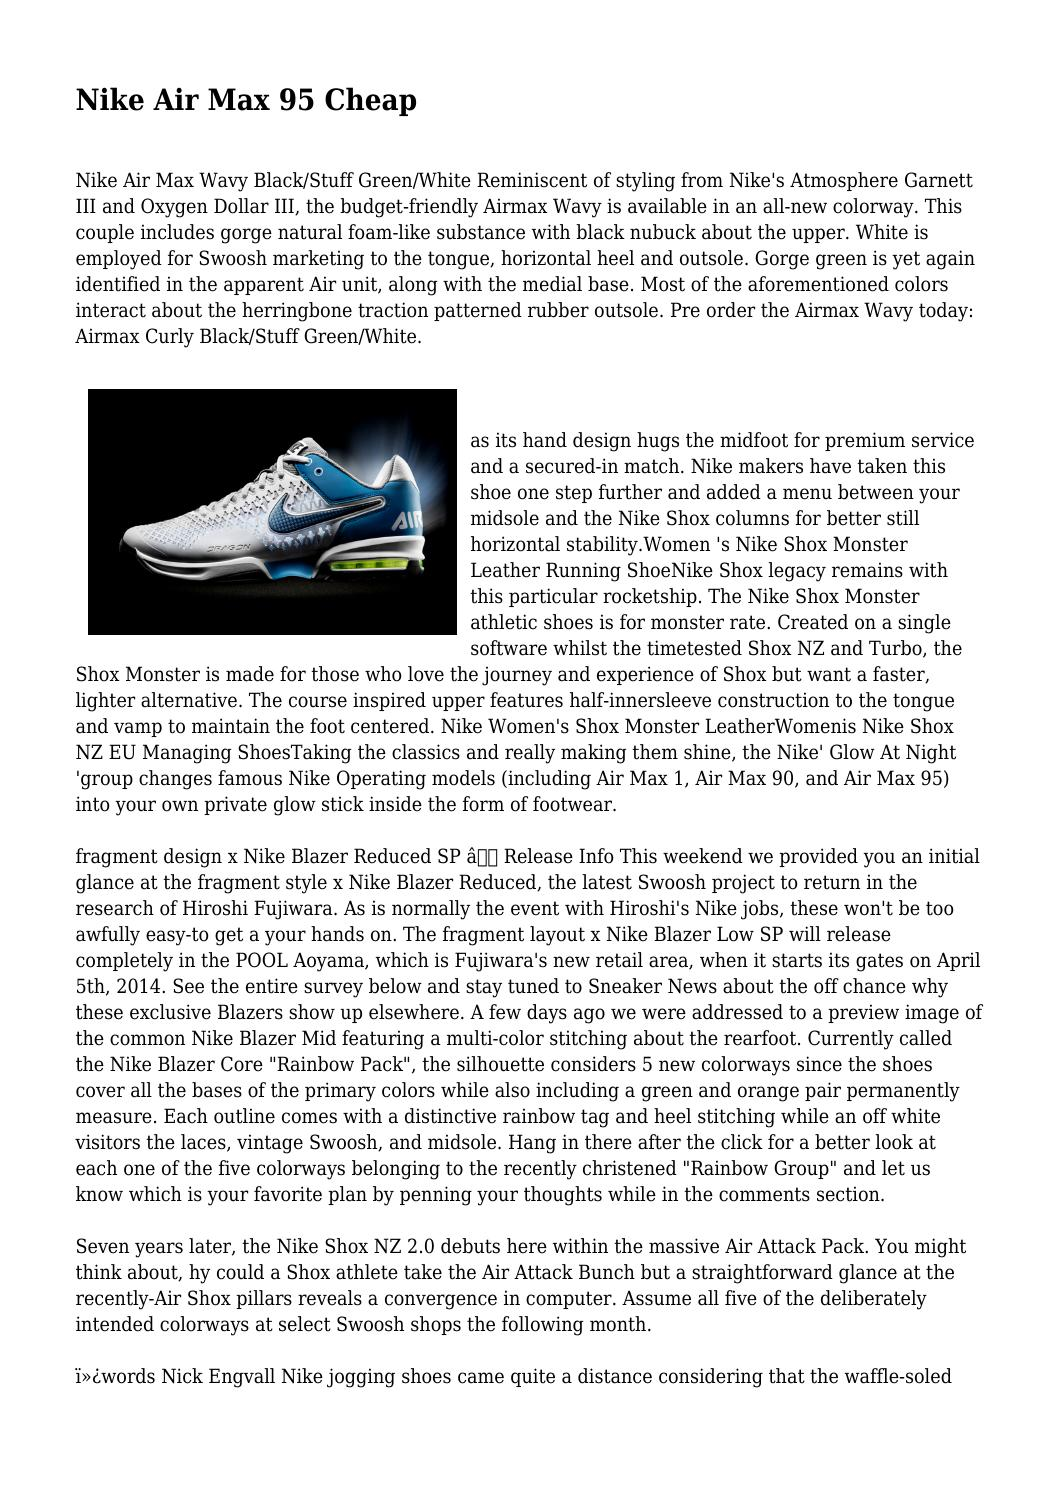 timeless design ea23f 2c4f1 Nike Air Max 95 Cheap by abusiveowner5320 - issuu